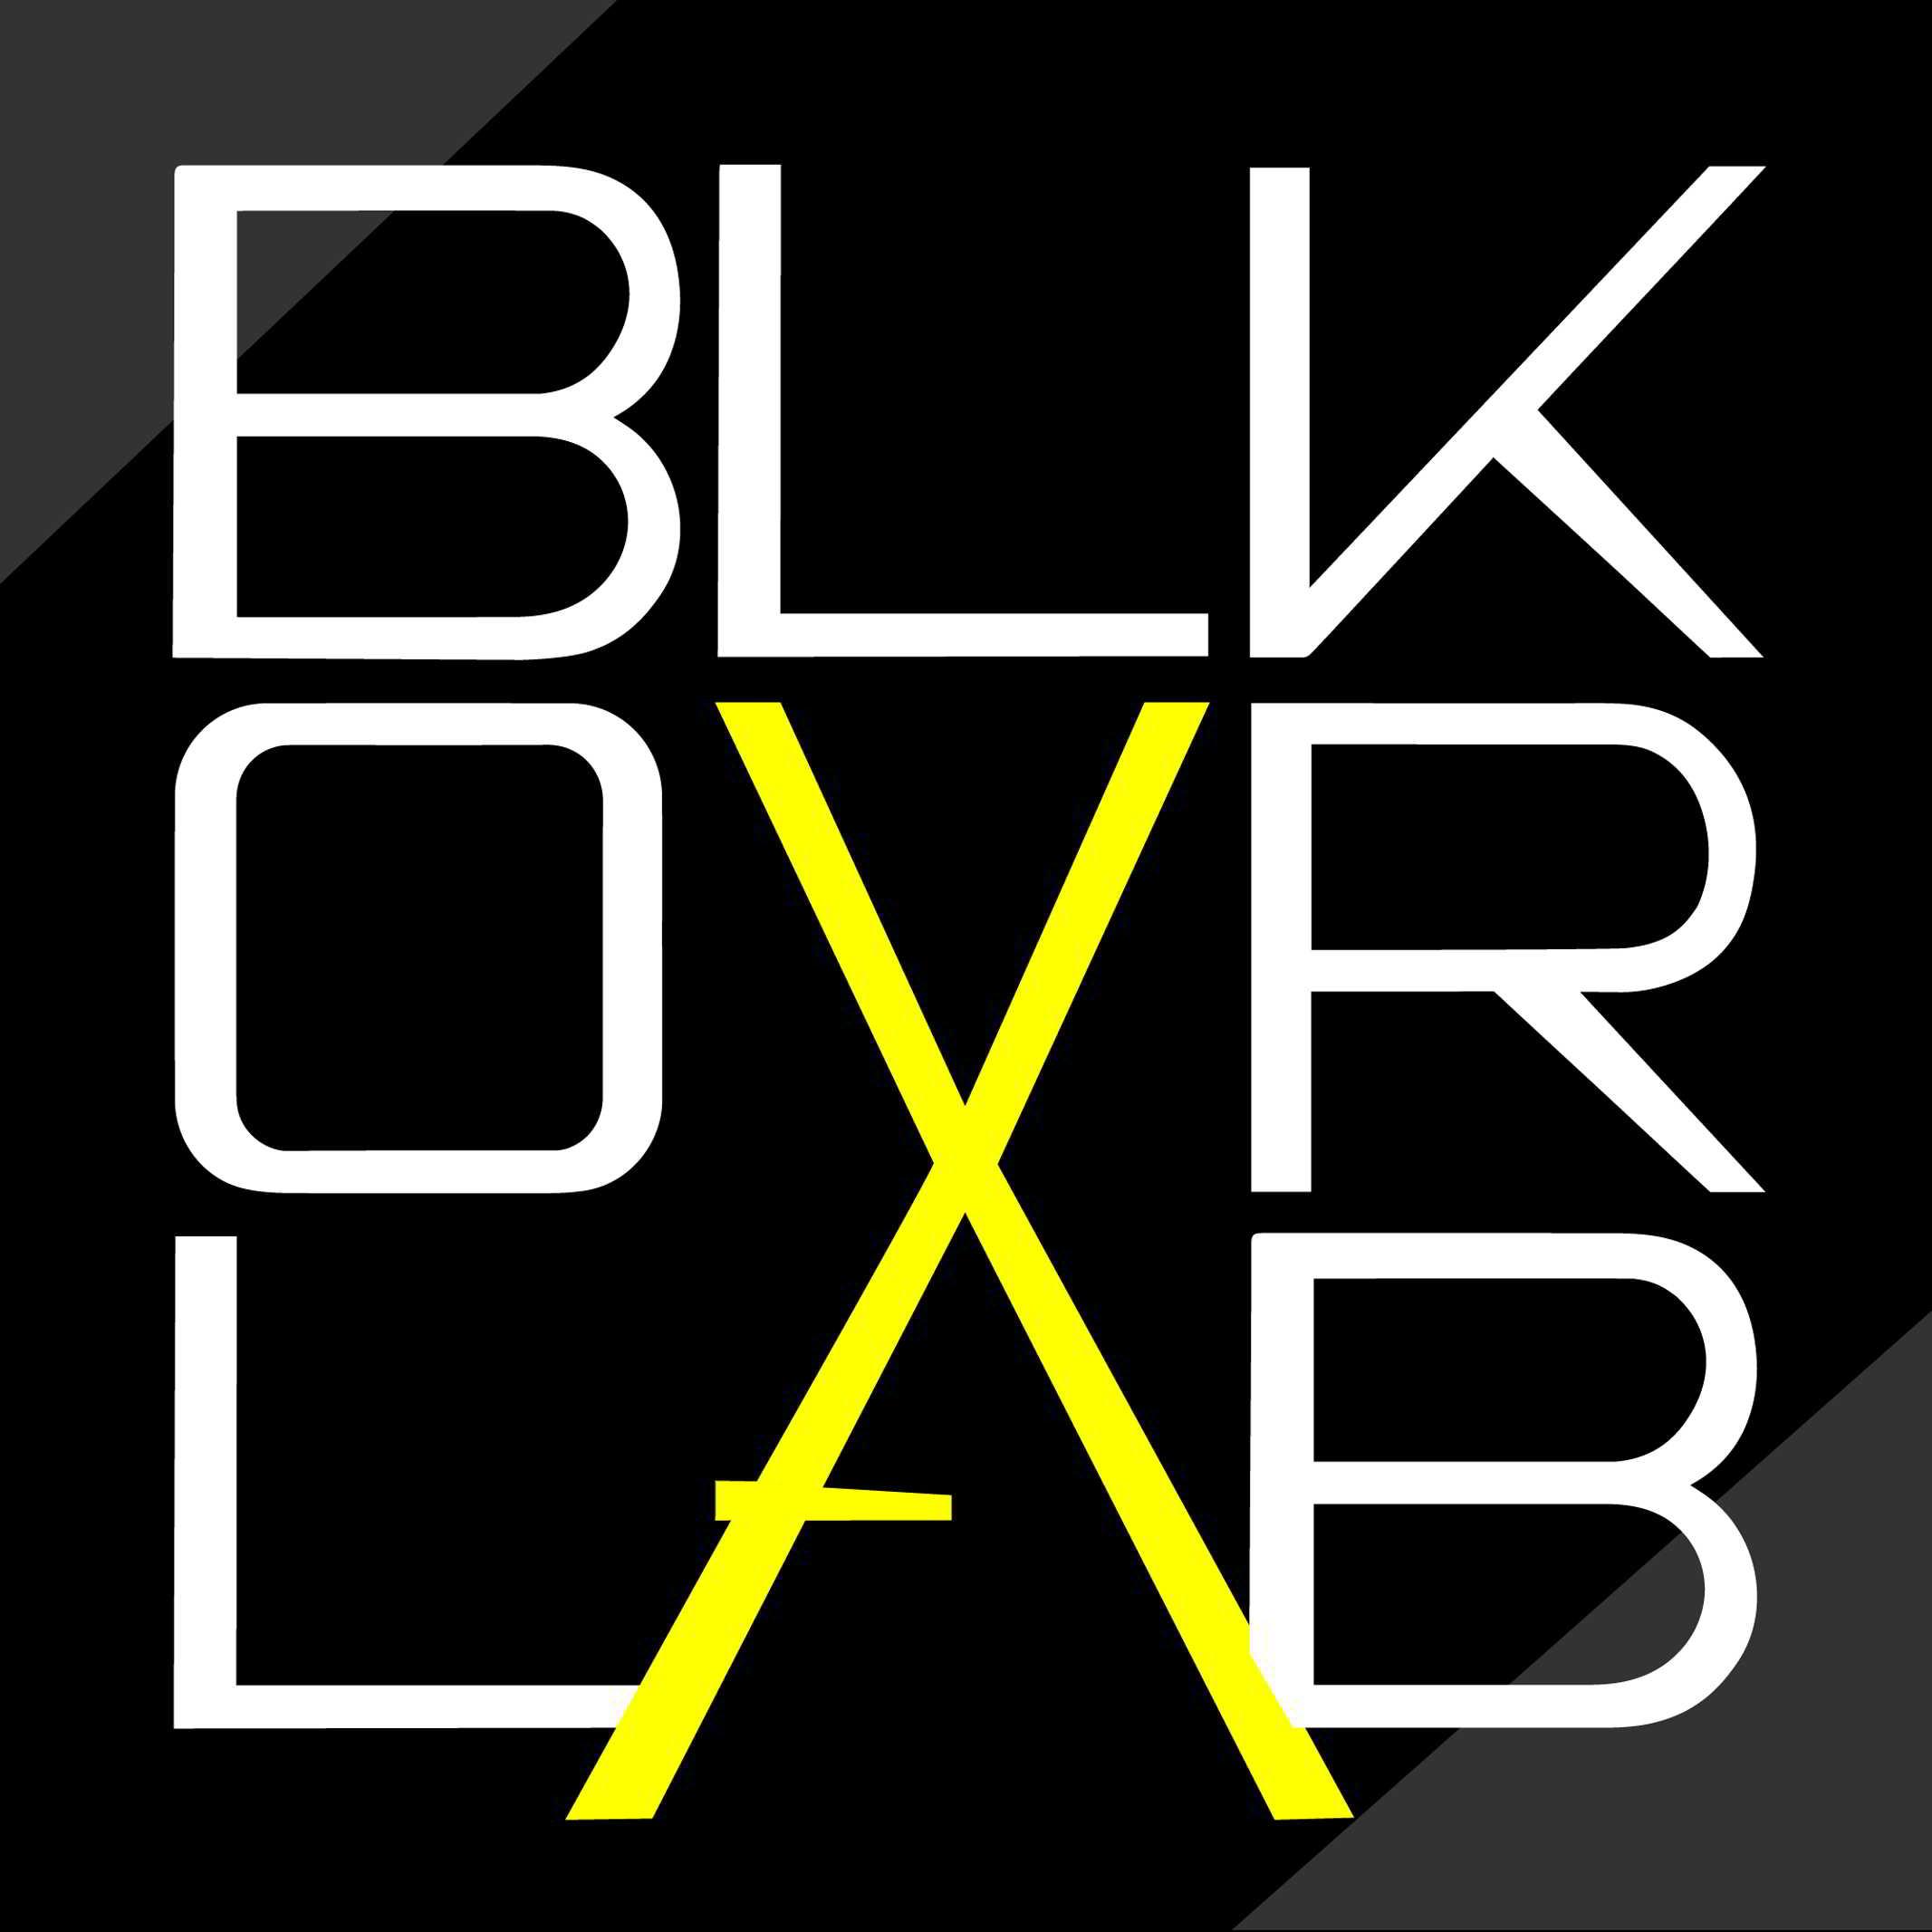 BlackOverLab